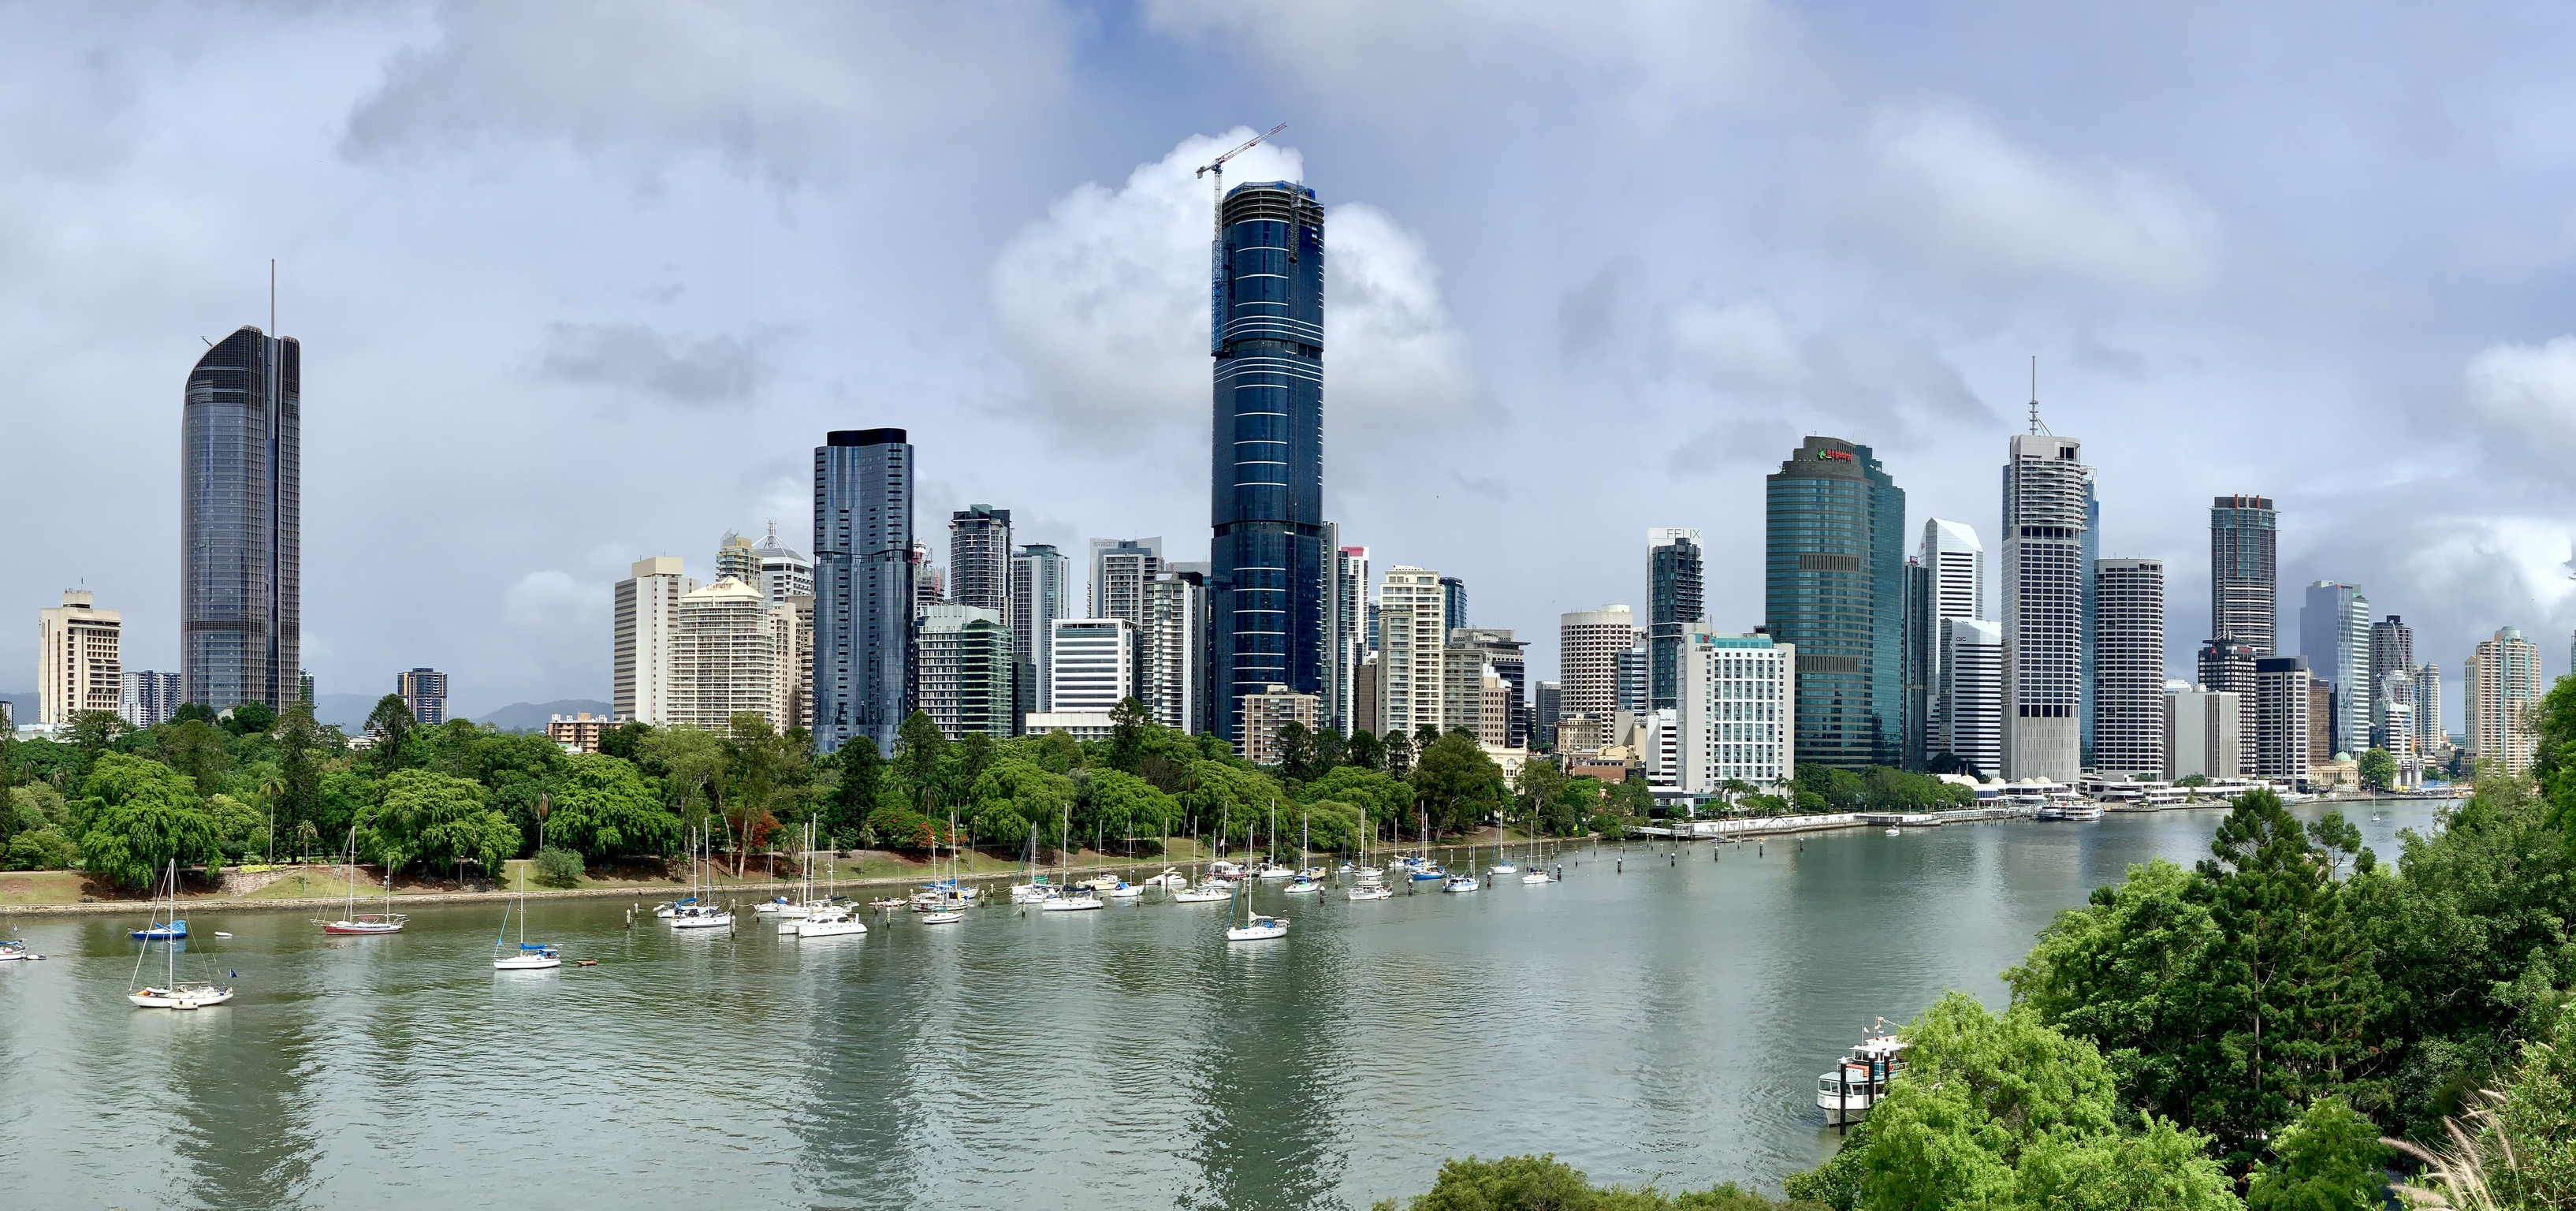 ≈ jean atwood City_Botanic_Gardens%2C_Brisbane_and_Brisbane_Skytower_under_construction_in_December_2018%2C_02